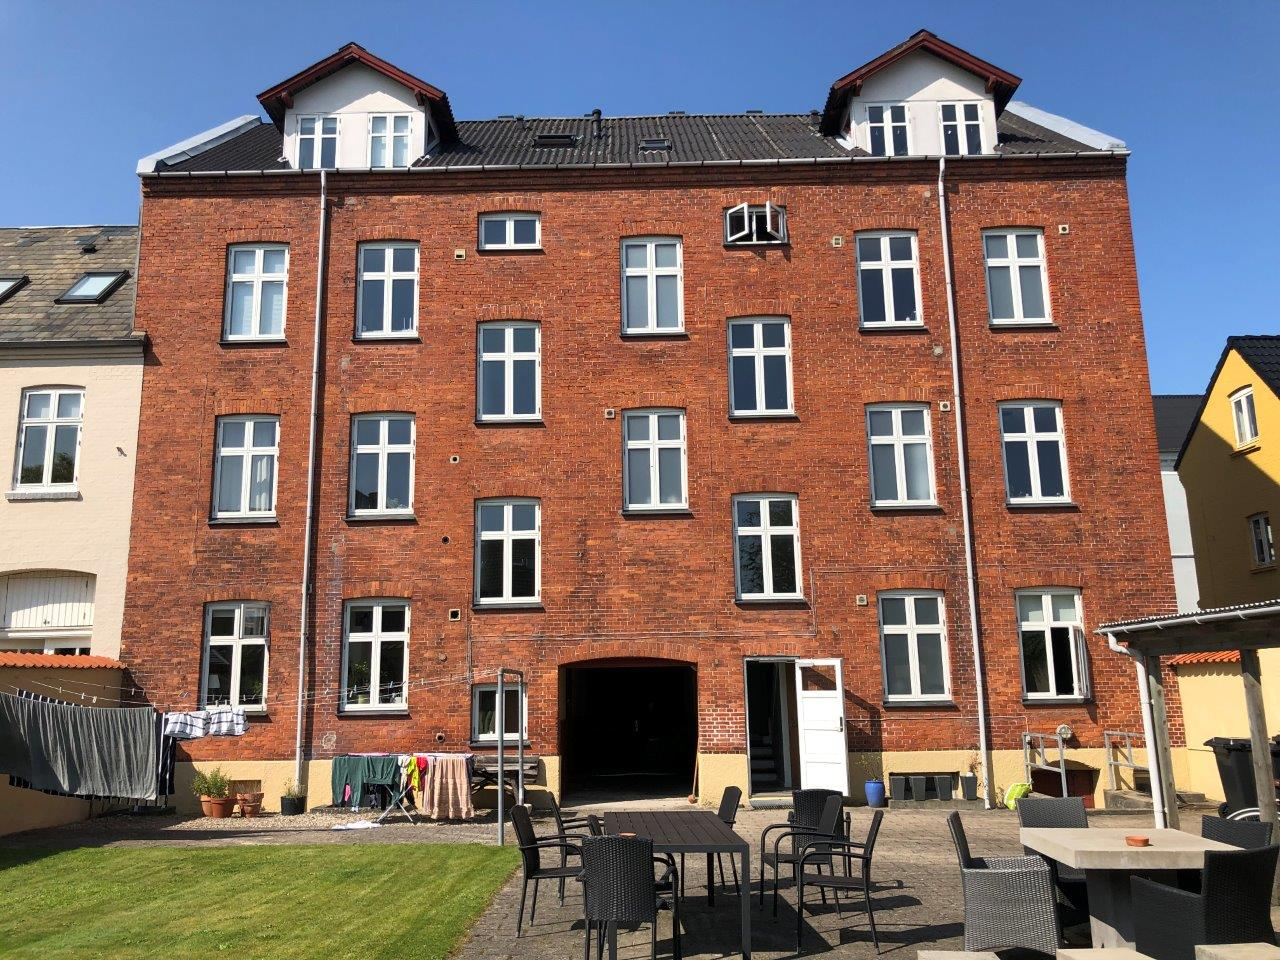 Dronningensgade 38, 5000 Odense C